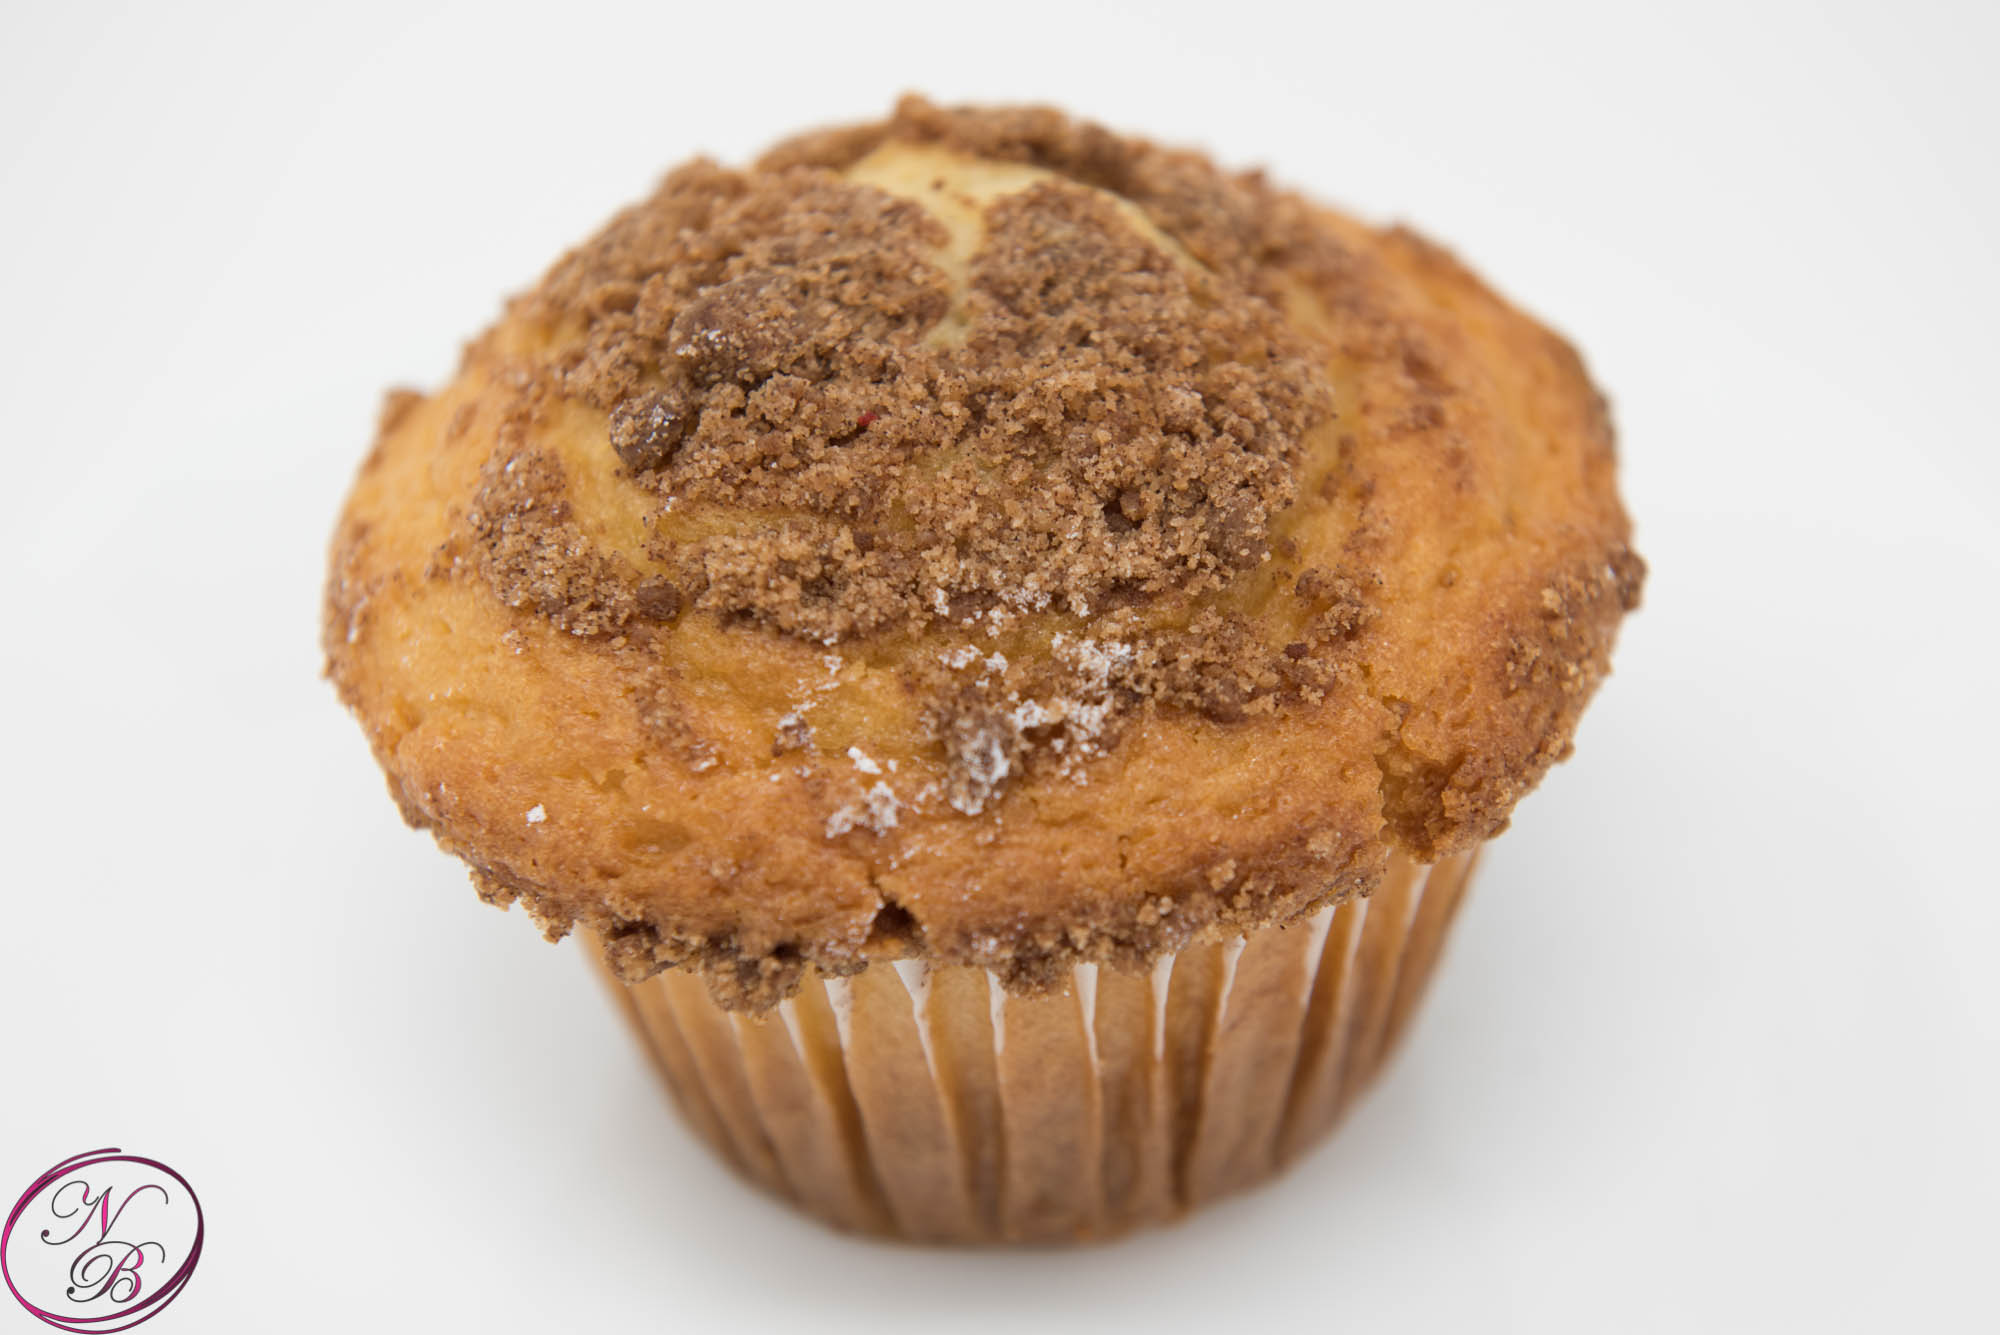 Cinnamon Streusel Muffin